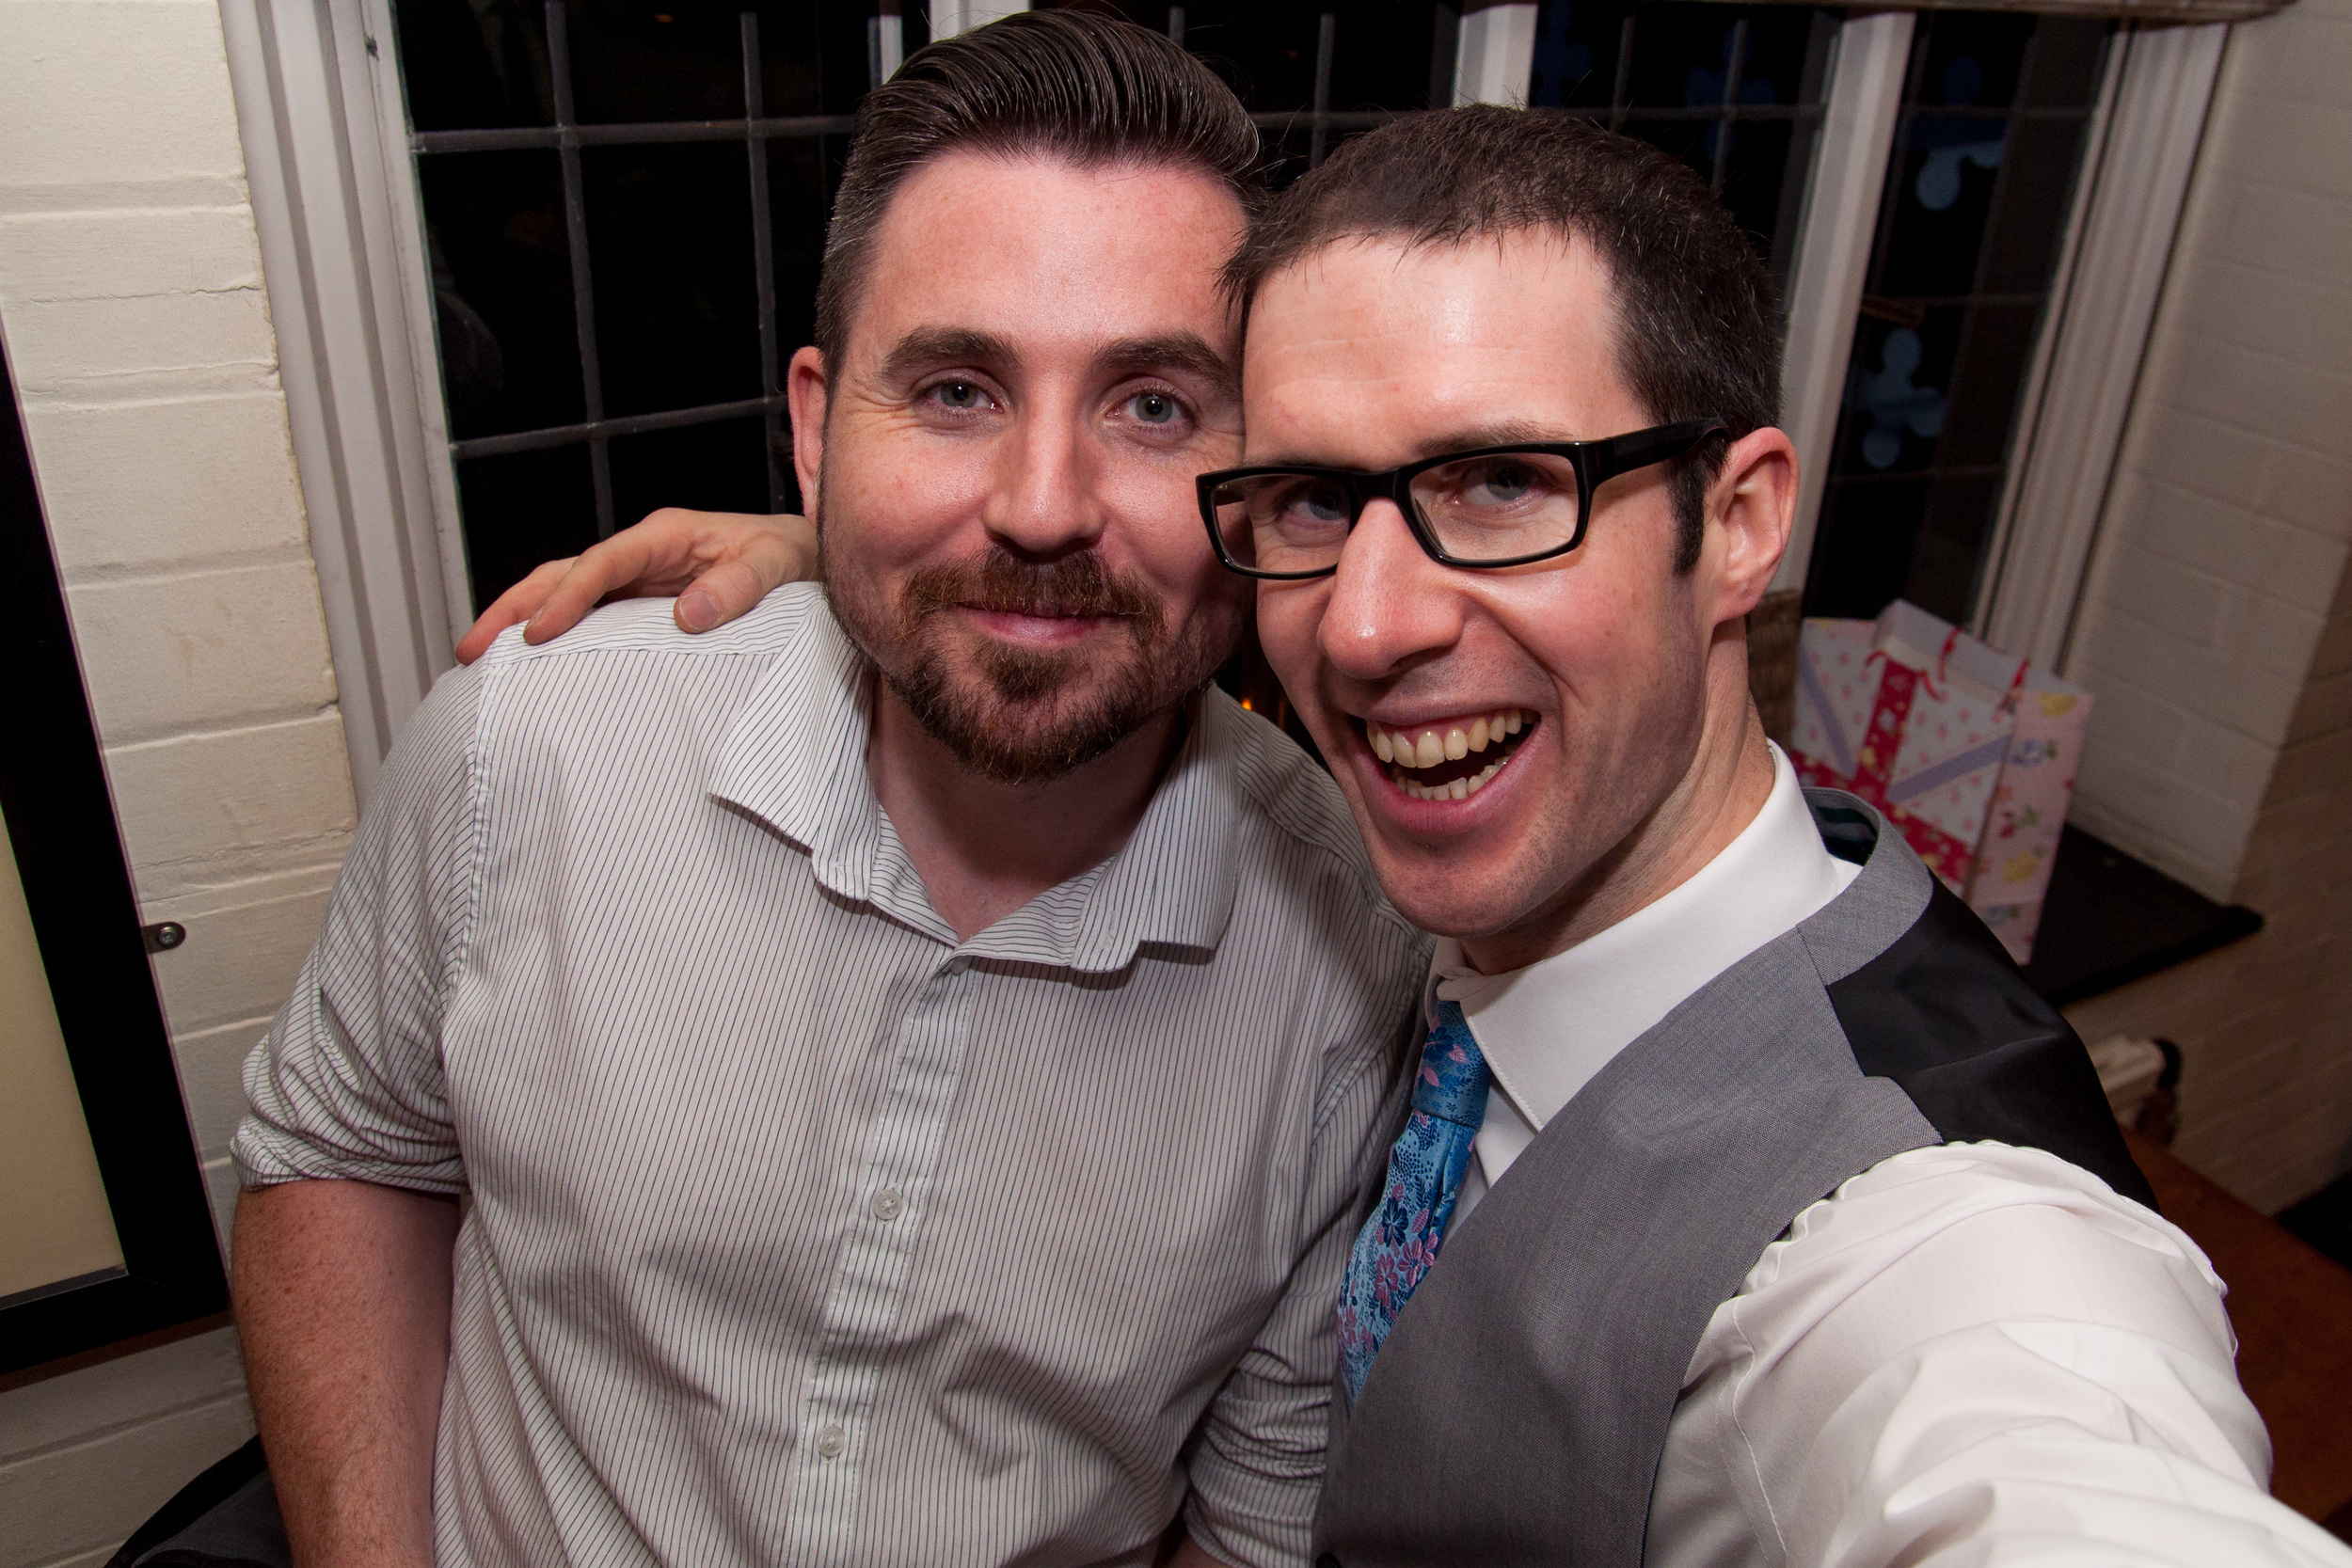 Wedding-DJ-Adam-Carr-and-Andy-Keher-at-a-Samlesbury-Hall-Wedding-in-Preston